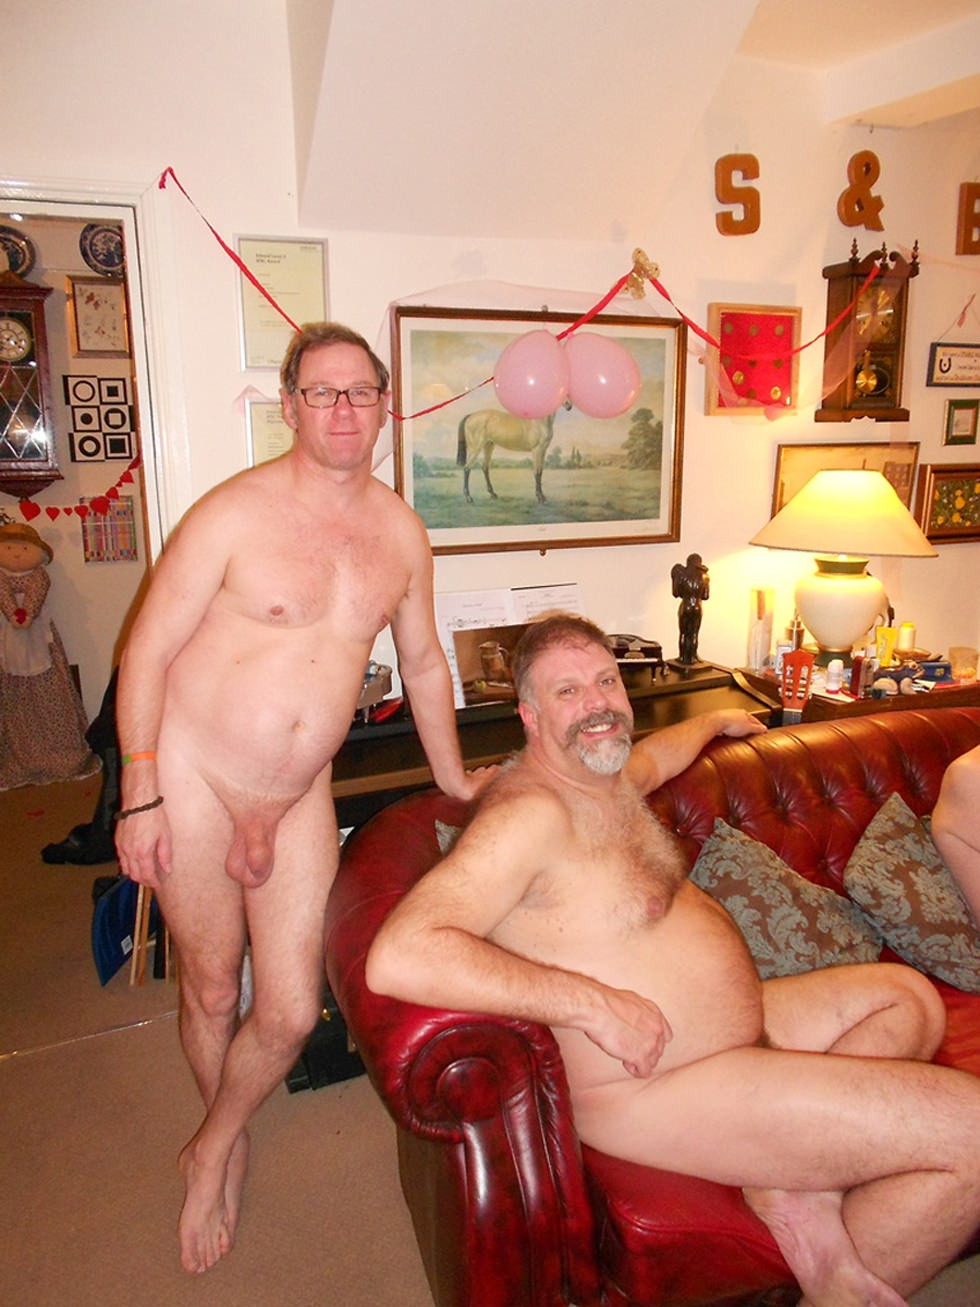 Fogardo y Pinjed os desean felices fiestas